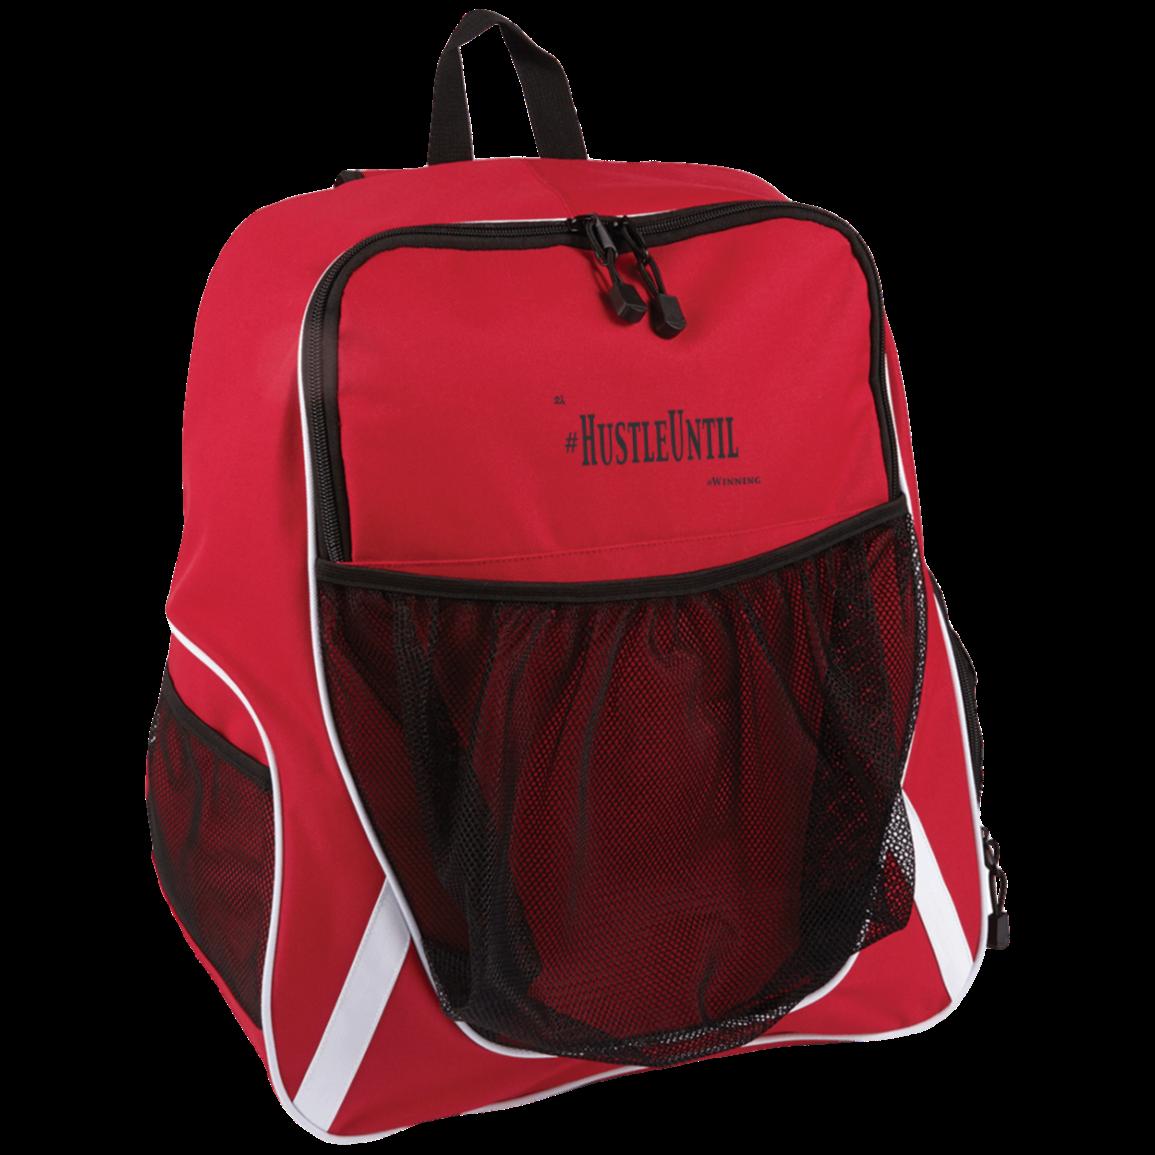 Hustle Until Team 365 Equipment Bag Products Backpack Bags Bags Backpacks